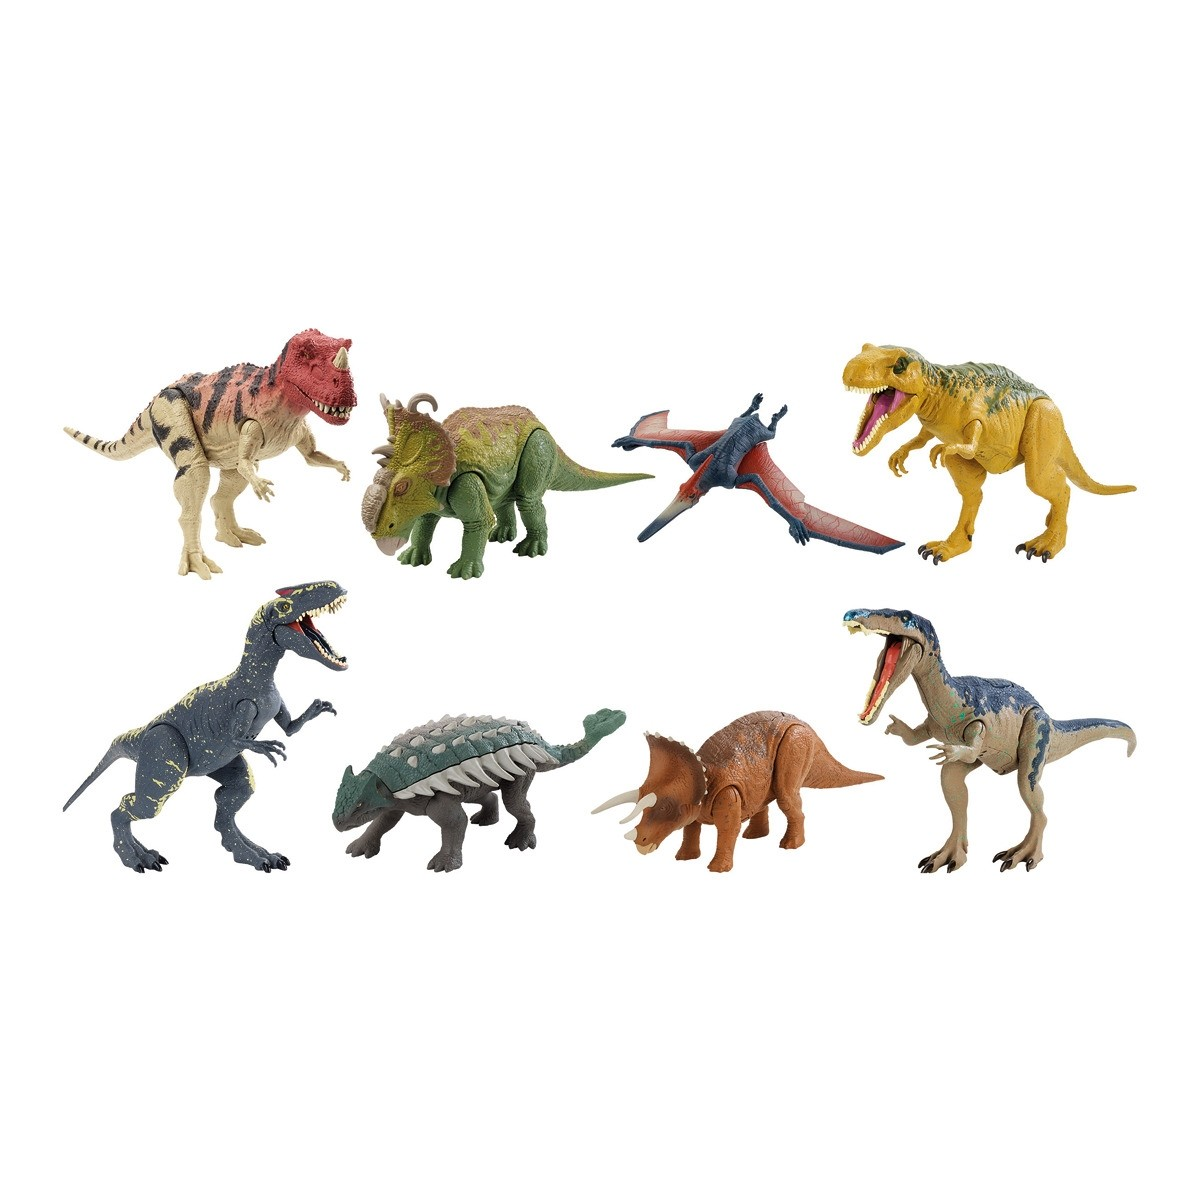 Jurassic World Dinosaurio Sonidos Diferentes Modelos Mattel Fmm23 Brico Reyes Zcm juguete dinosaurio indoraptor dinosaurios juguete juguetes clásicos para niño modelo animal figuras de acción mandíbula móvil. jurassic world dinosaurio sonidos diferentes modelos